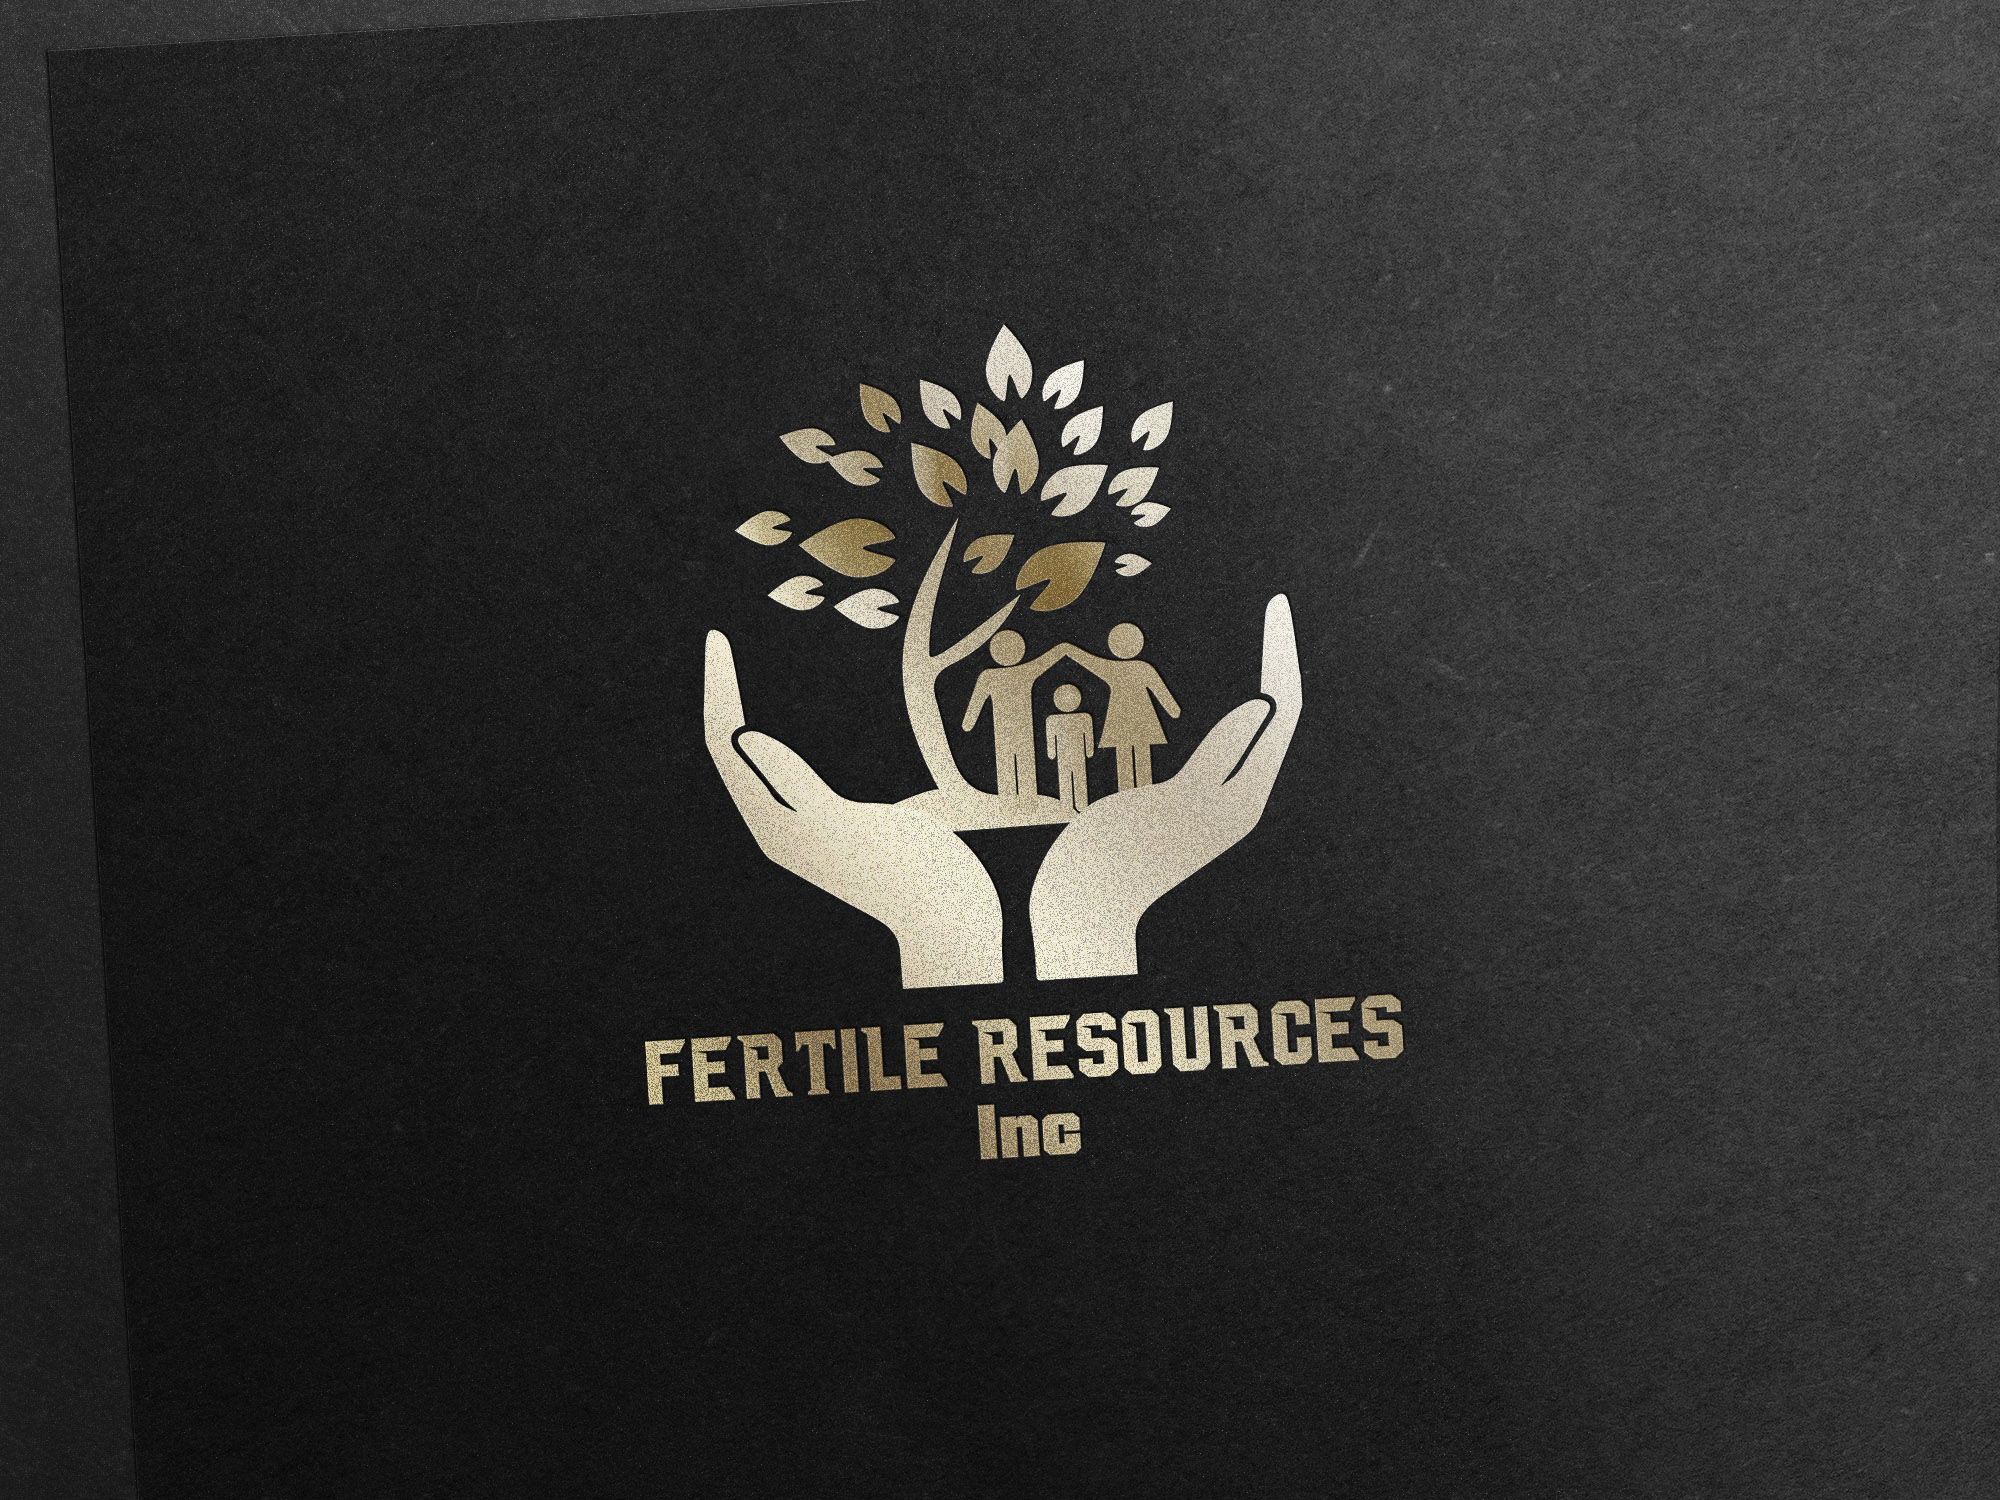 Logo Design by Umair ahmed Iqbal - Entry No. 106 in the Logo Design Contest Fertile Resources, Inc. Logo Design.